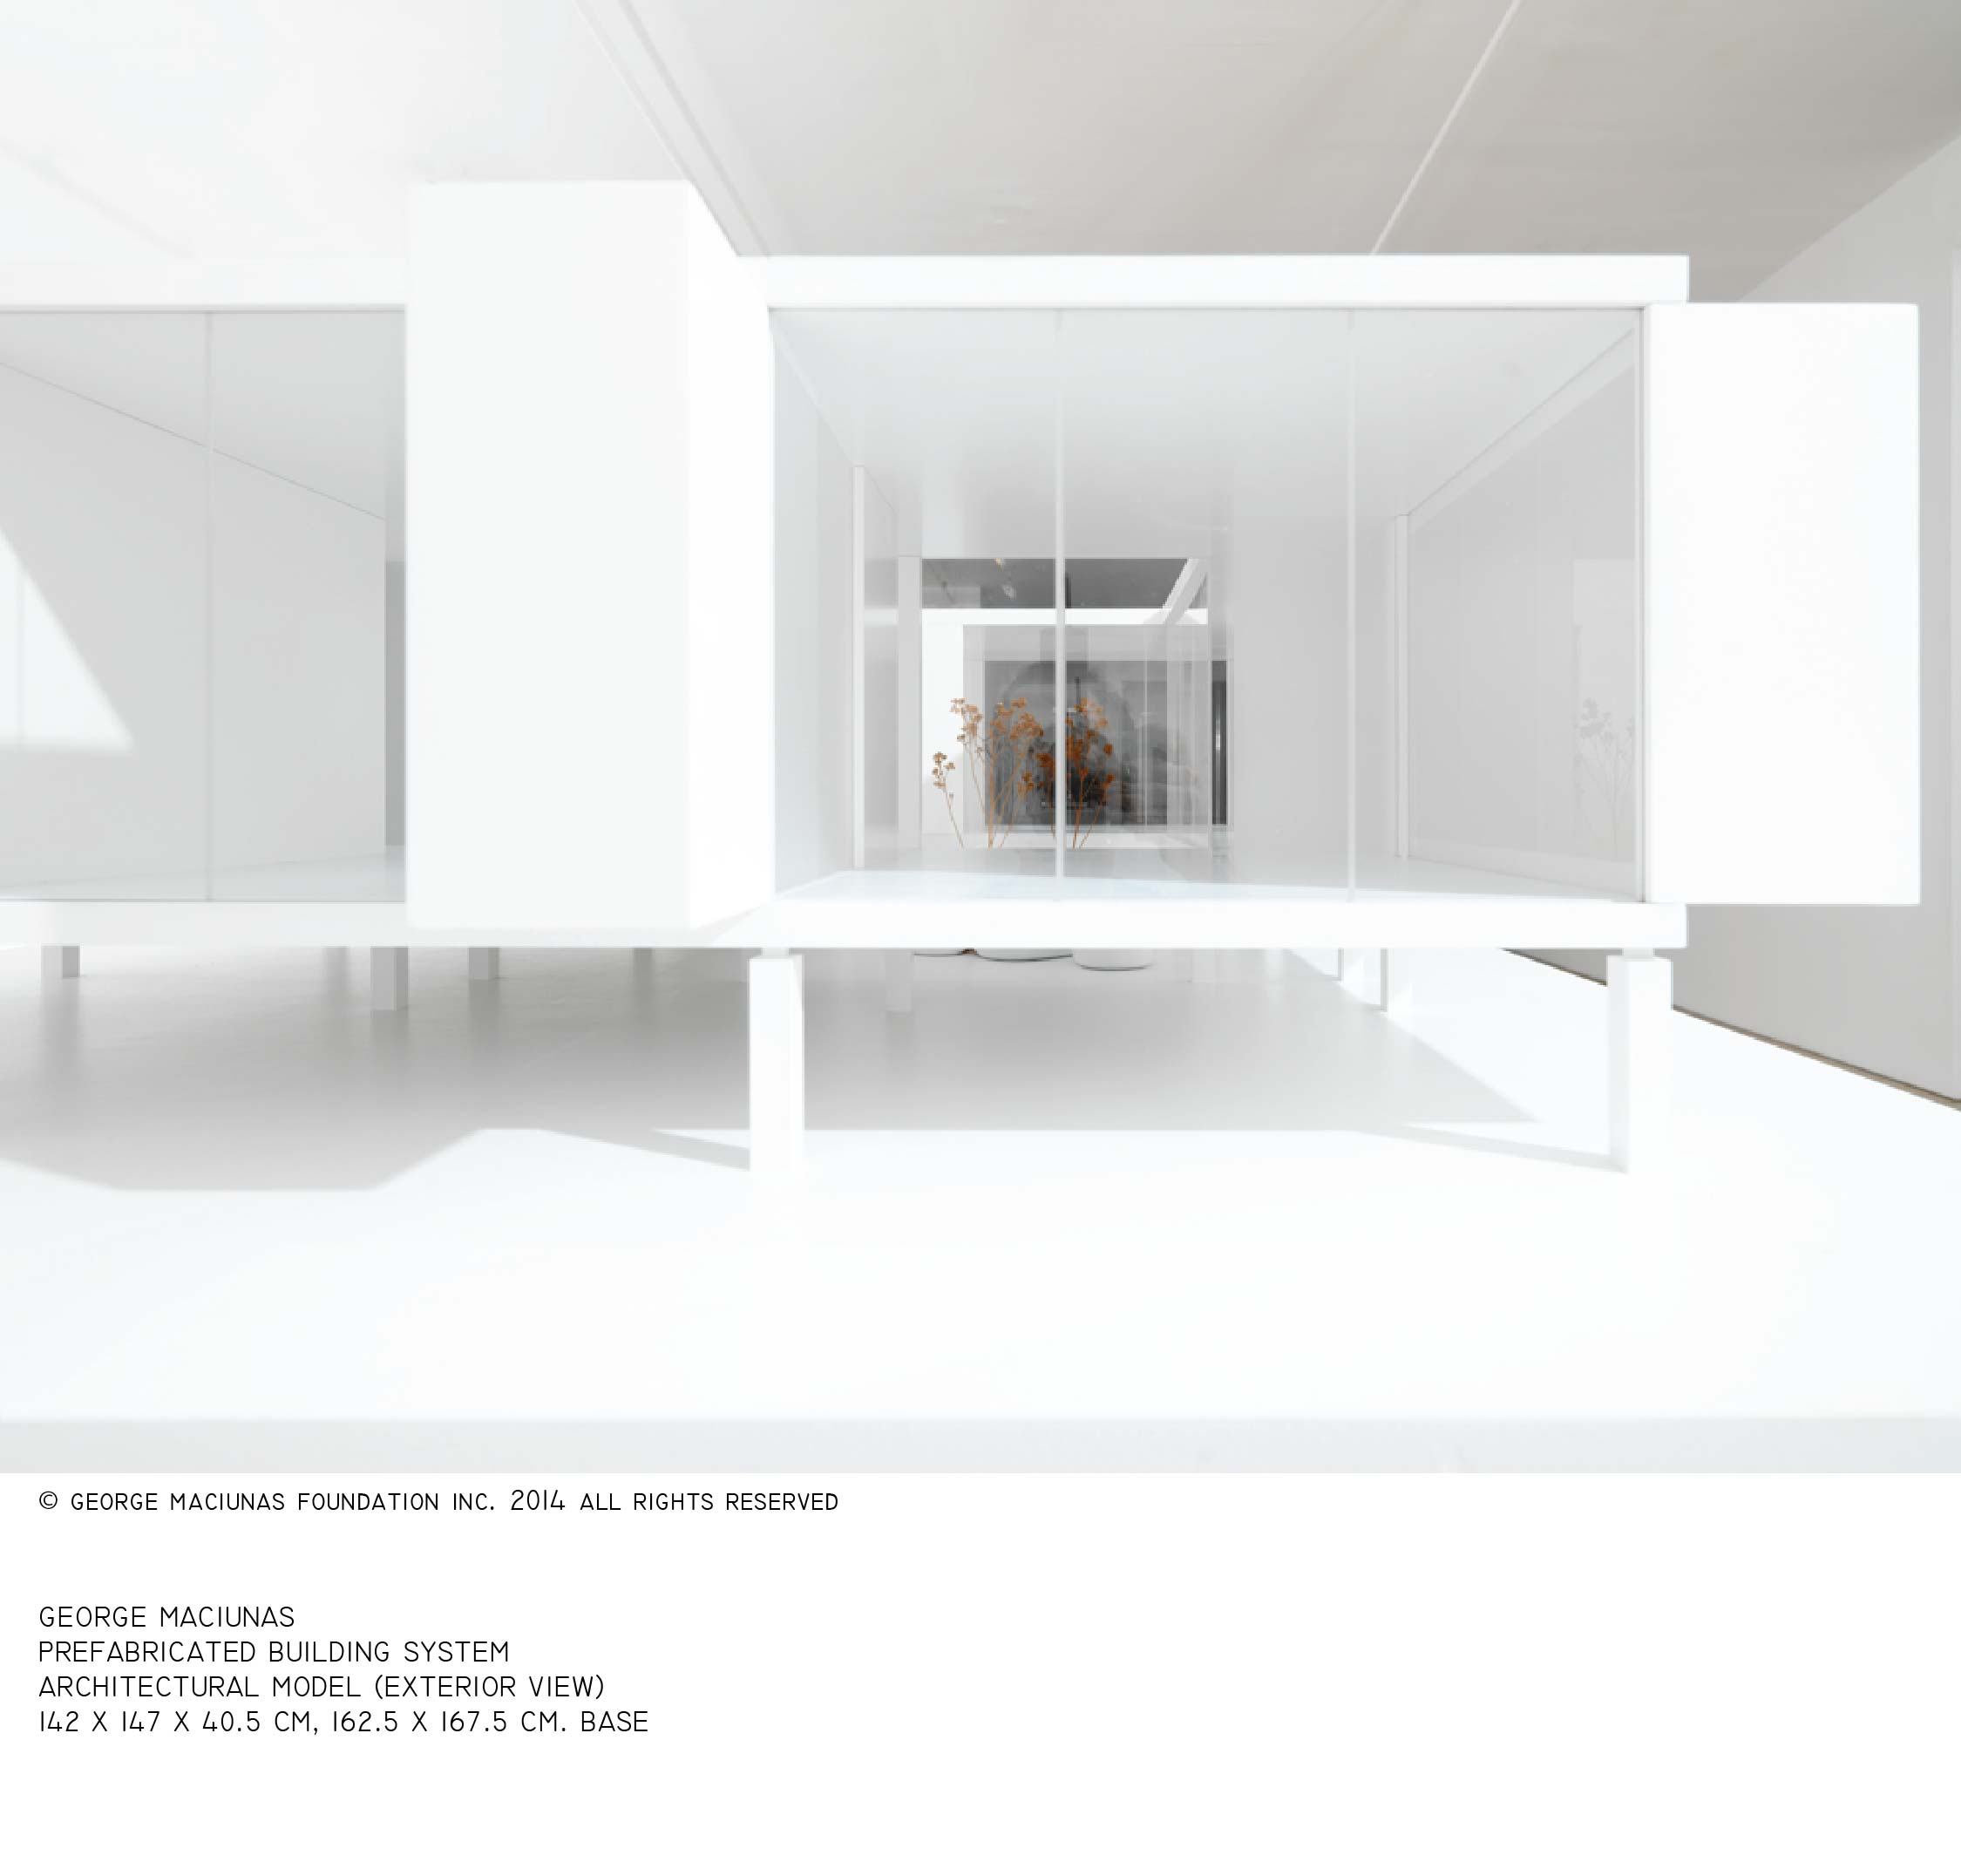 FLUXHOUSE ARCHITECTURAL MODEL (4)